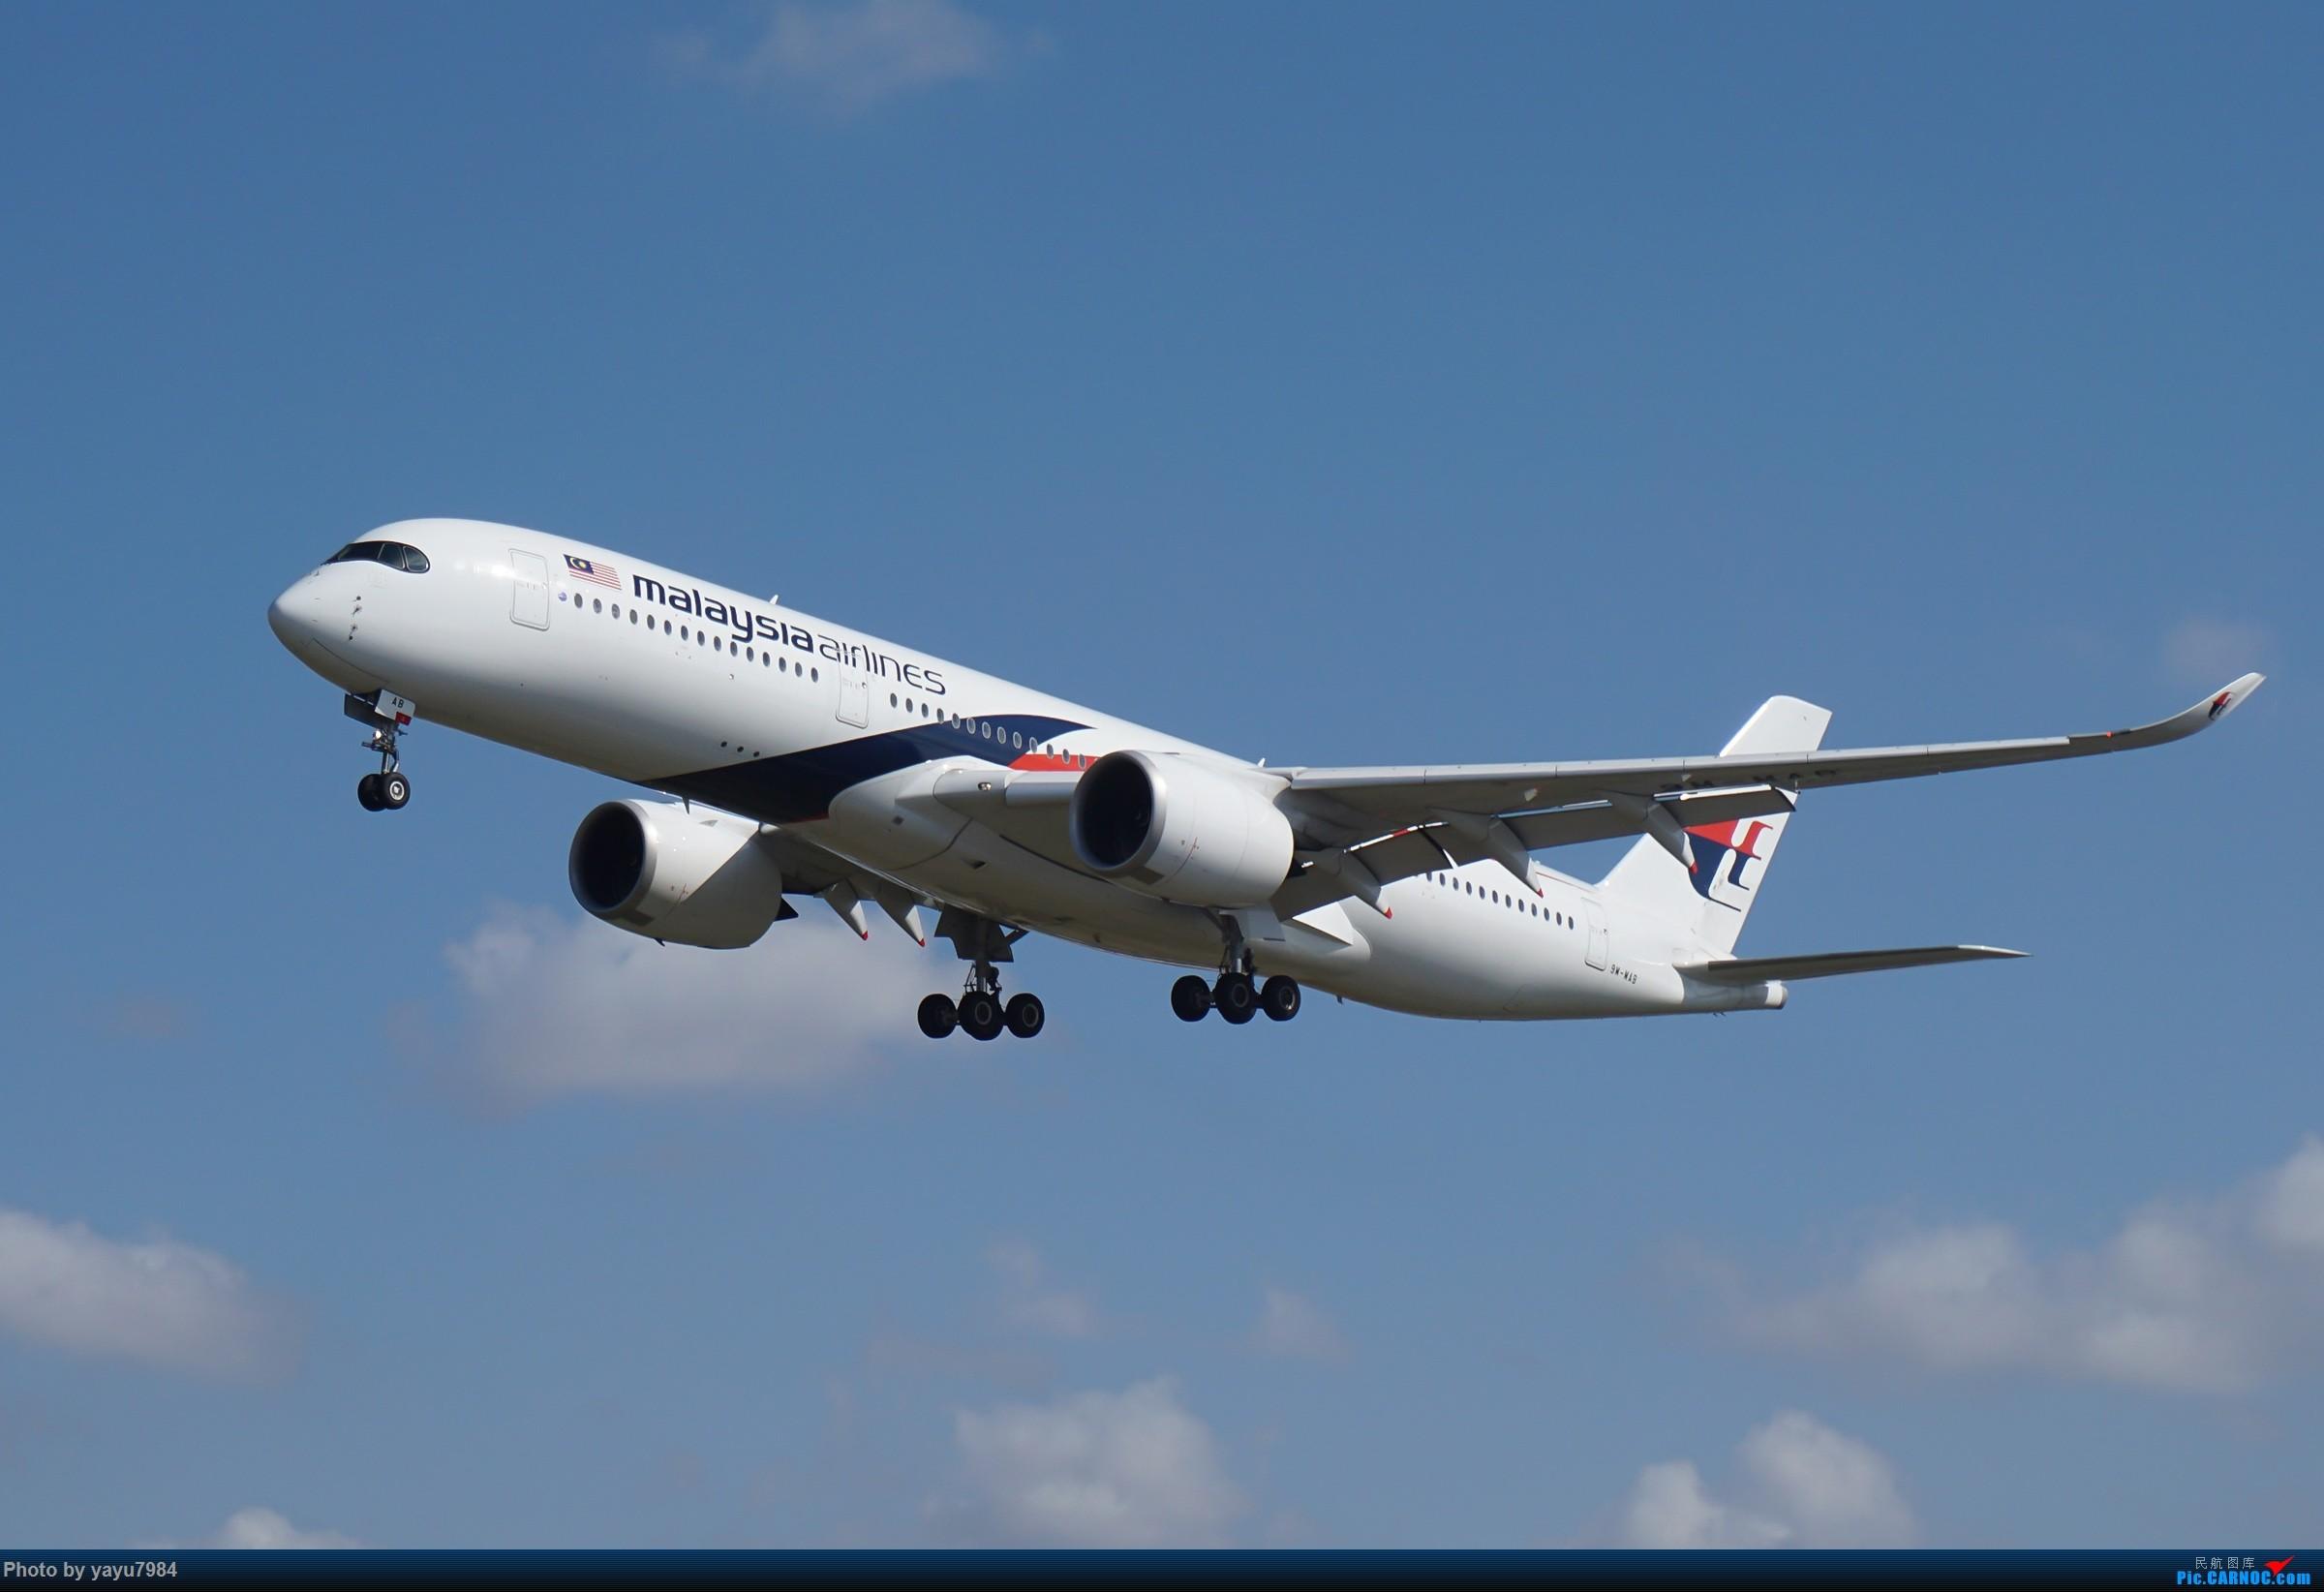 Re:[原创][SYD] 东航天合332,雪绒花343,华航蓝鹊,以及其他日常货 AIRBUS A350-900 9M-MAB 澳大利亚悉尼金斯福德·史密斯机场